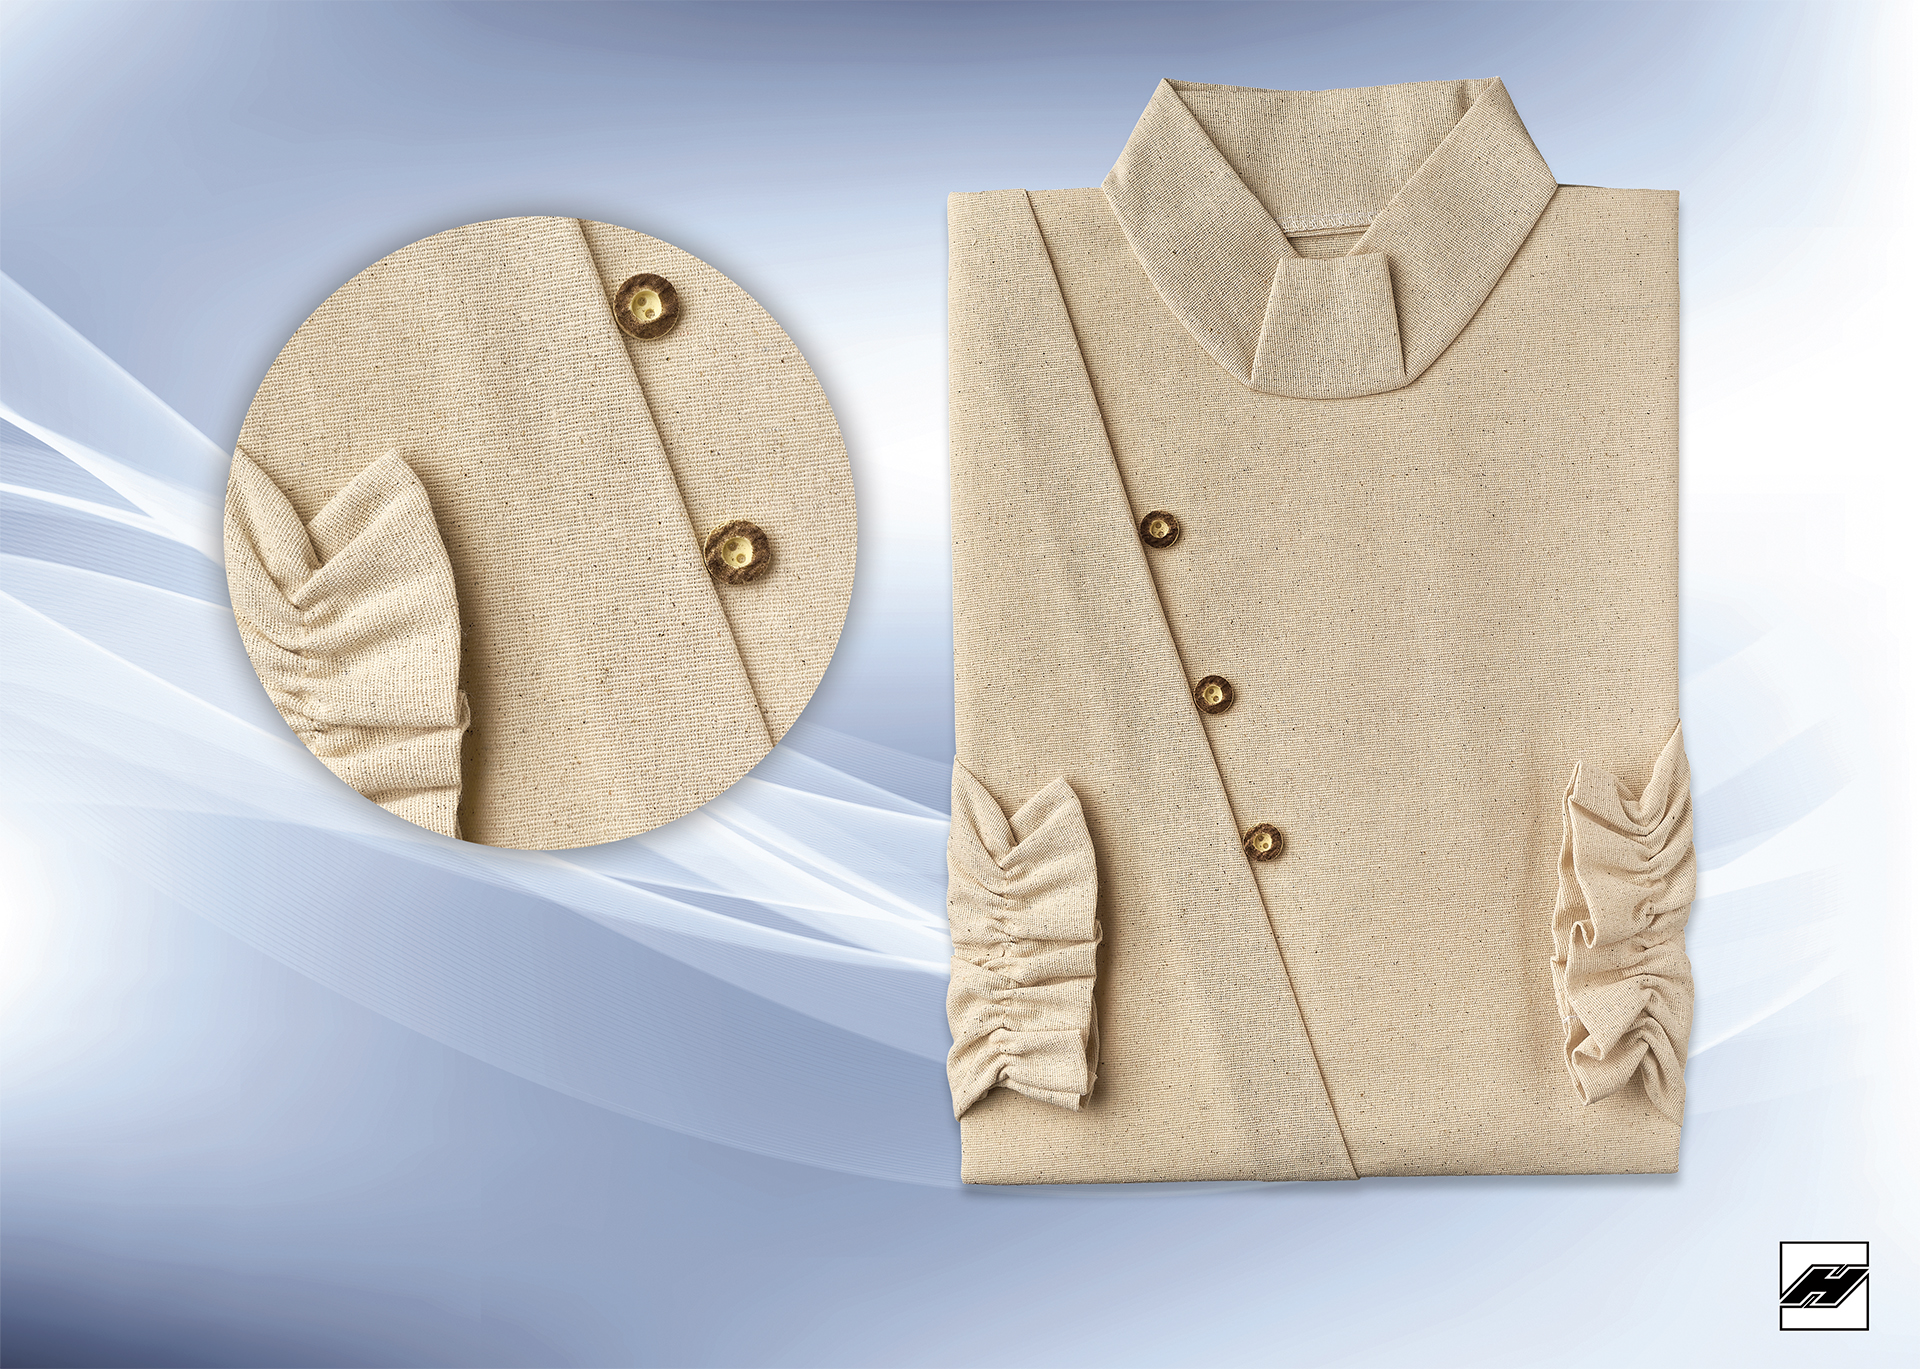 Damenkleid 2087 Chantung, Horn-Imitat-Knöpfen